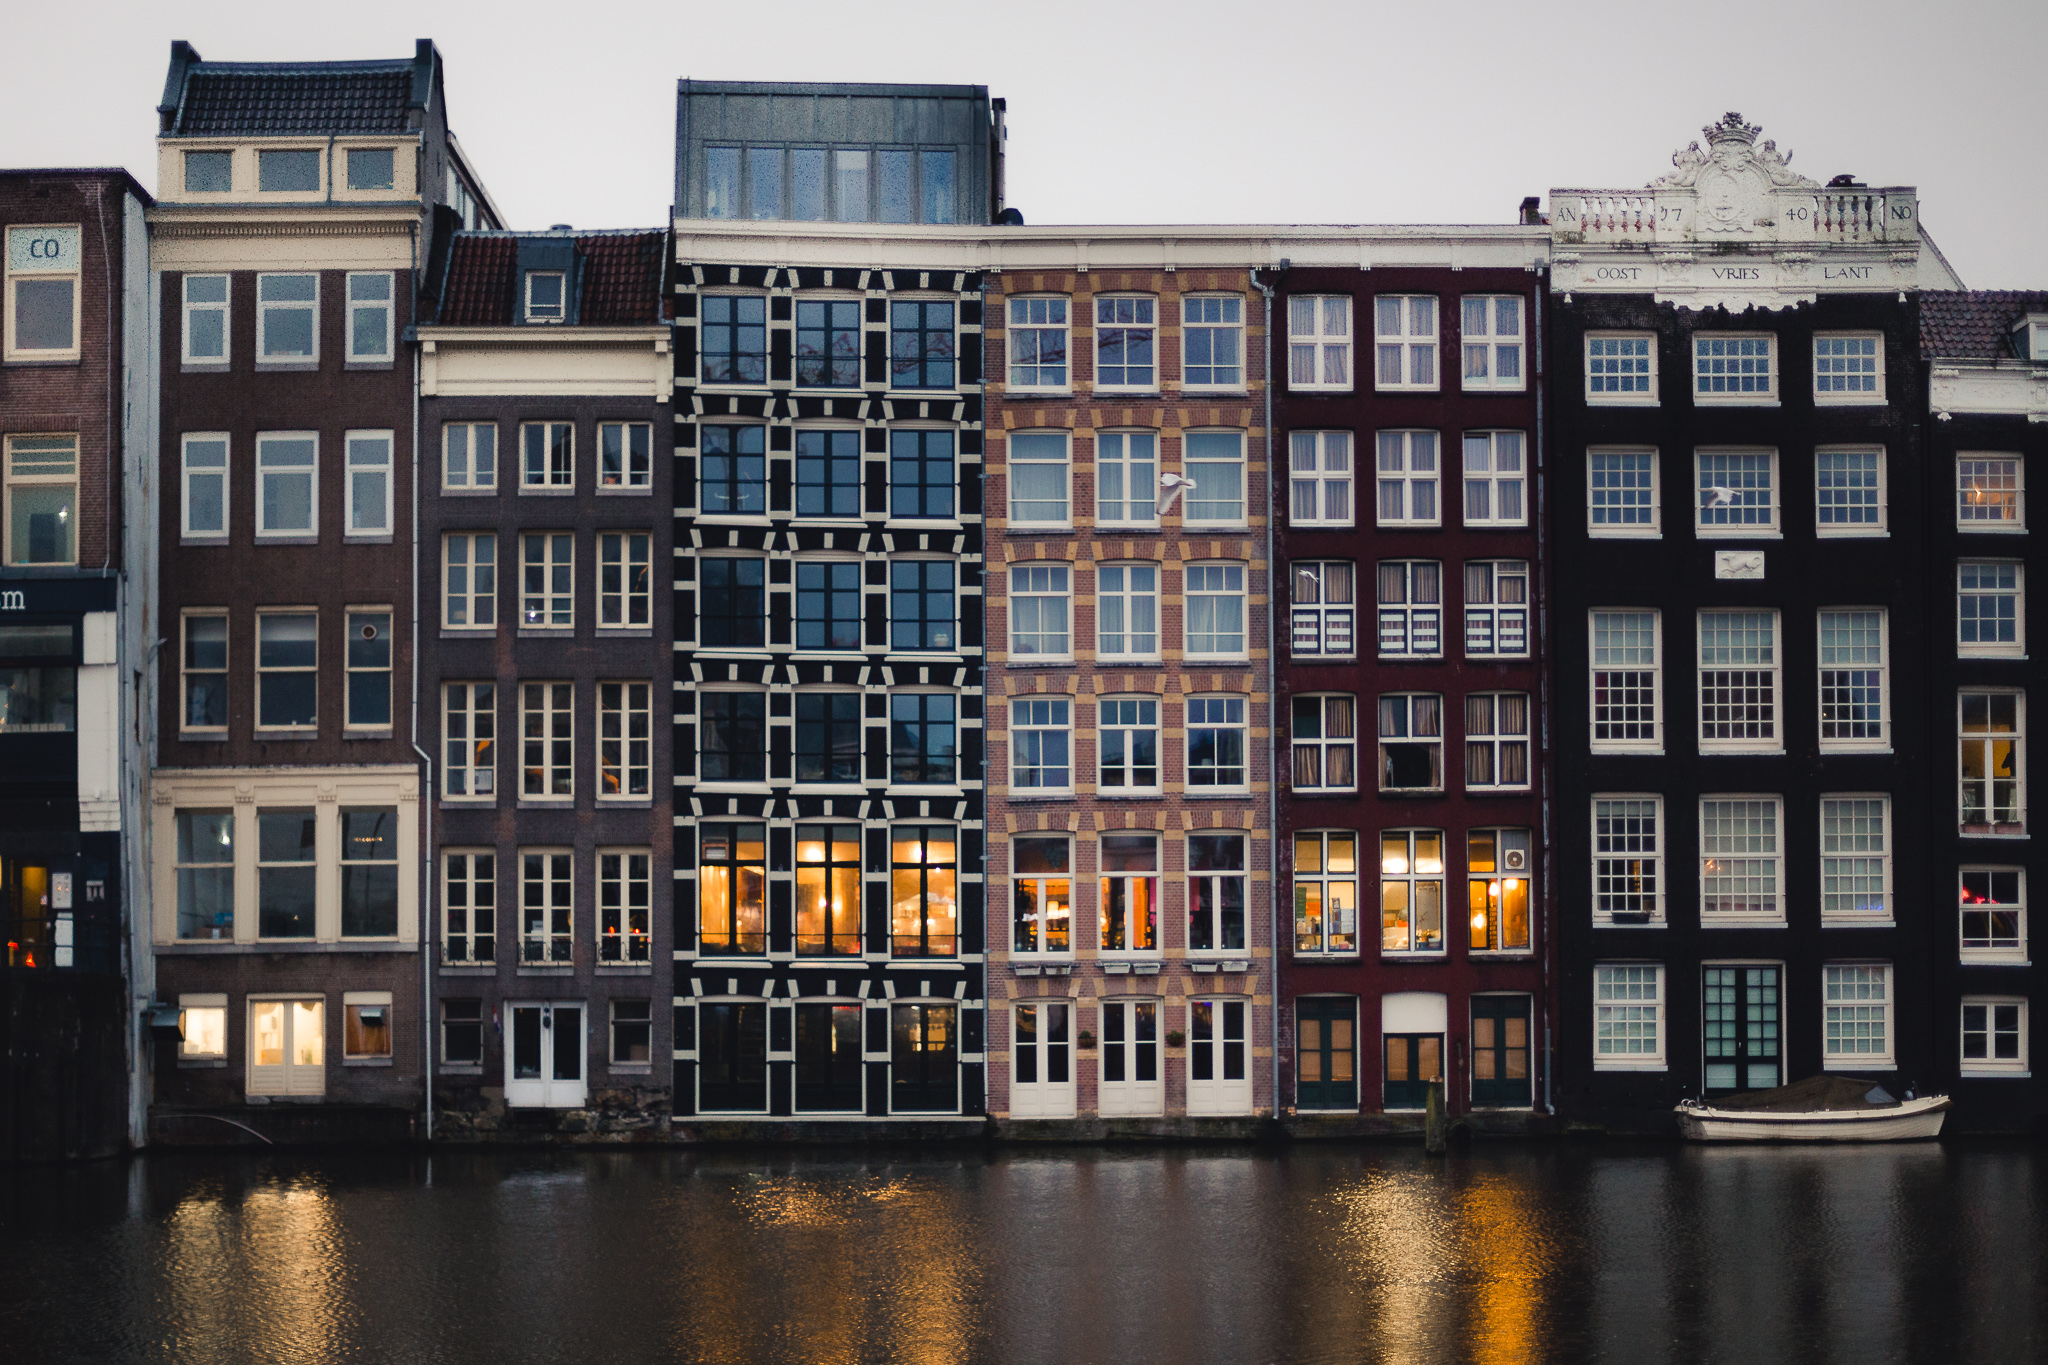 Zastávka v Amsterdamu